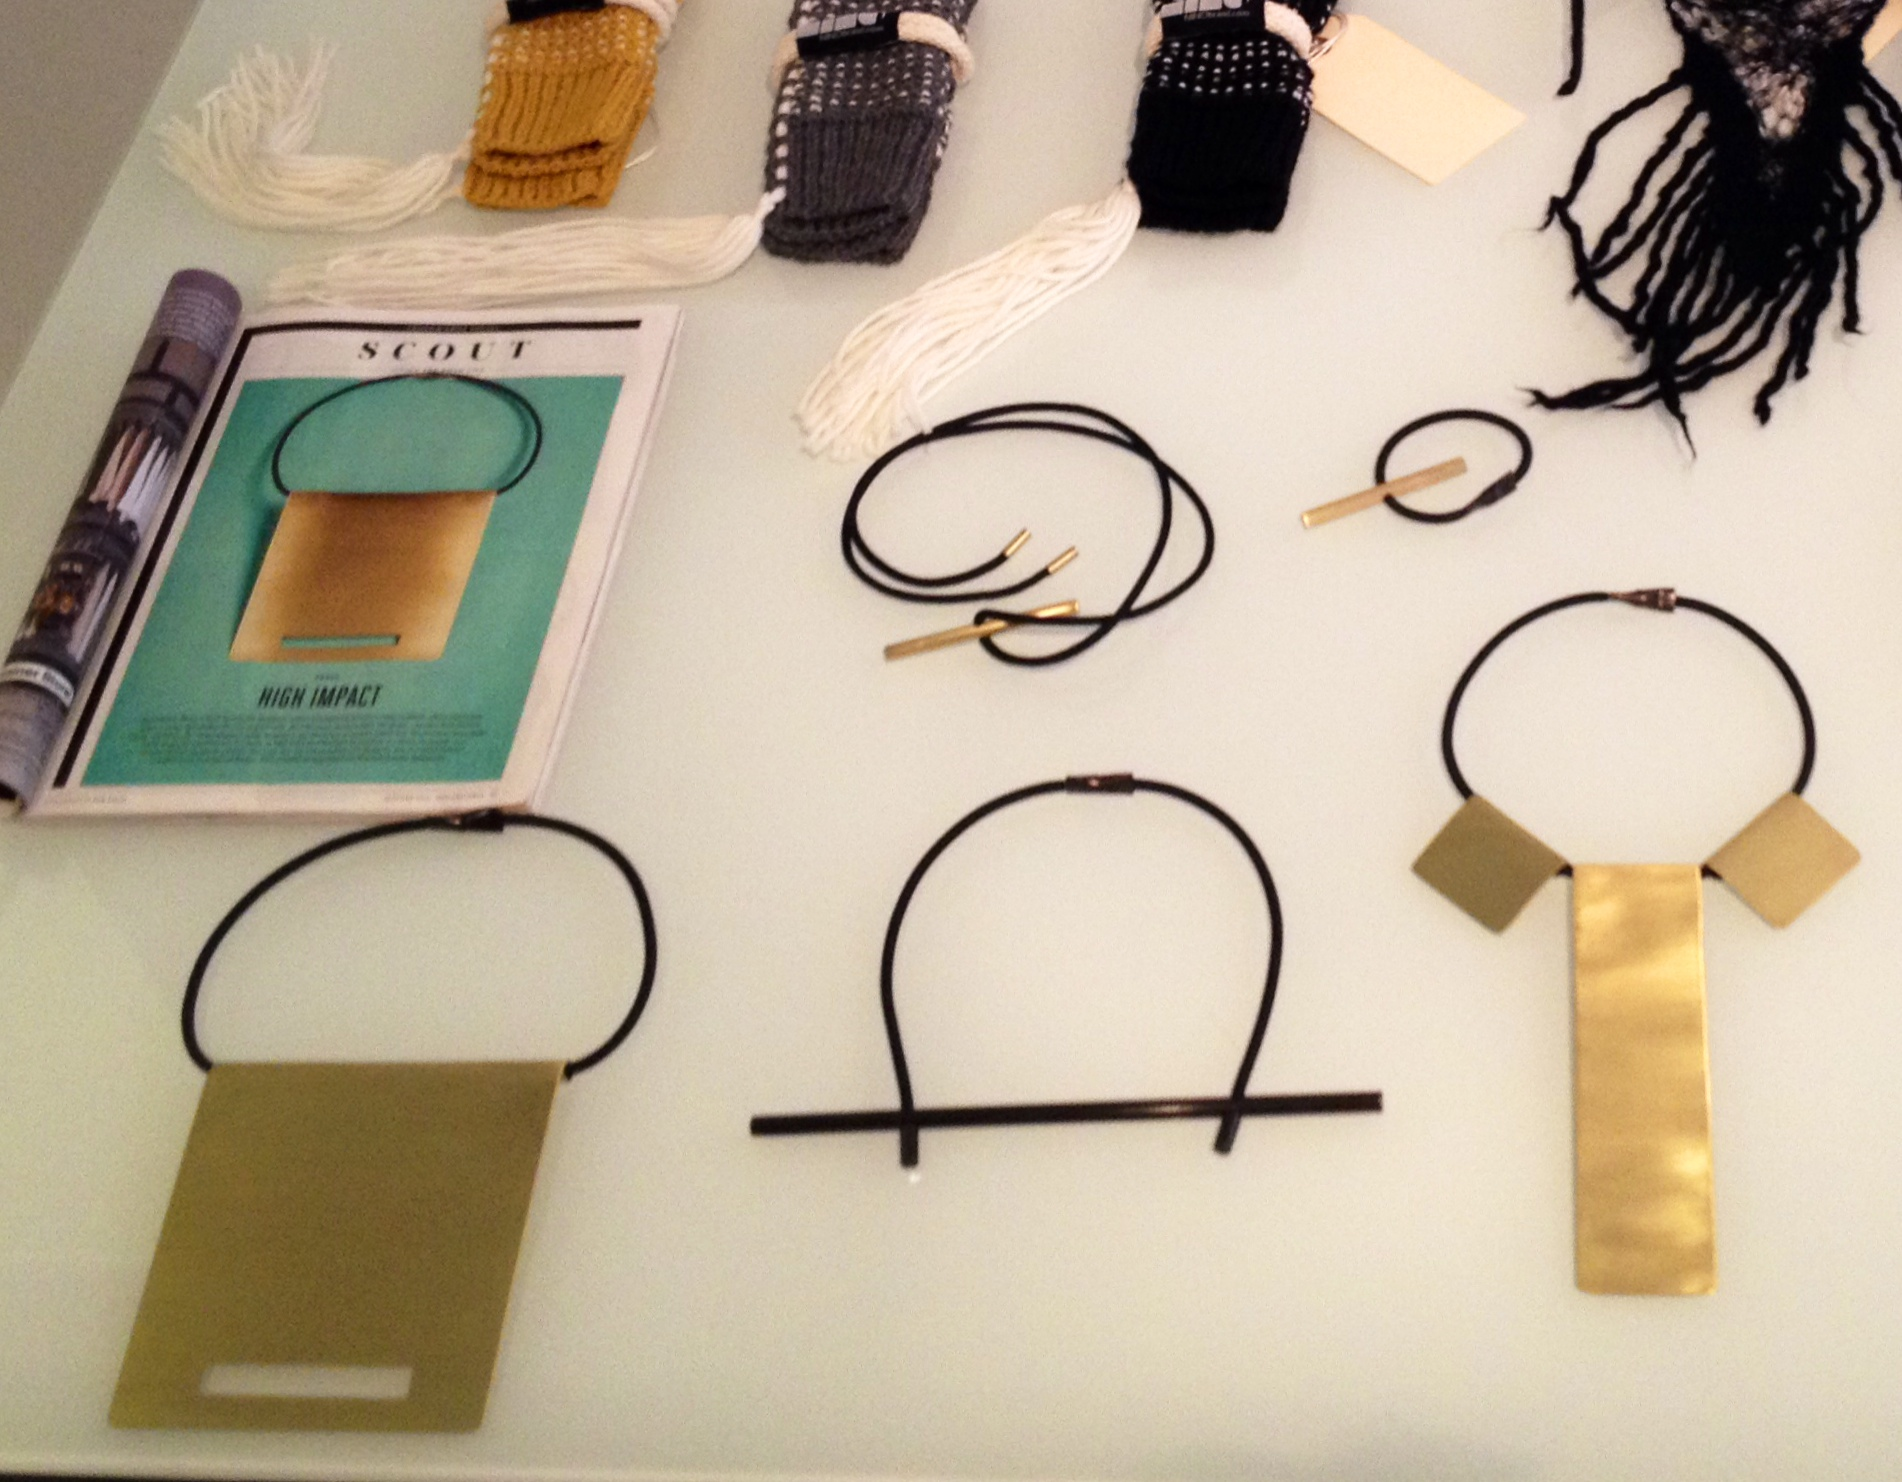 Hubba hubba-NINObrand's latest jewelry line.